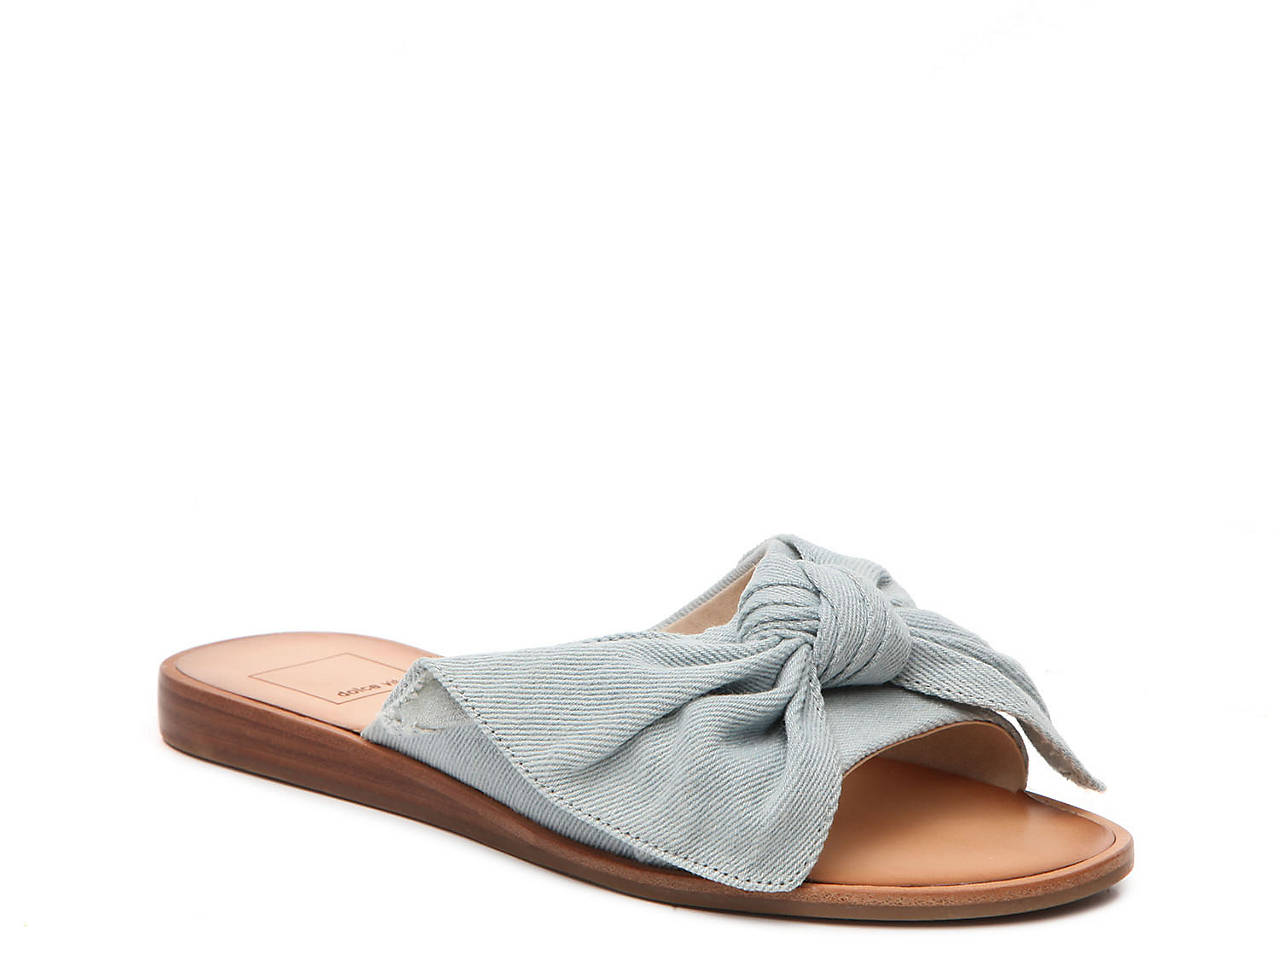 ce8142f70733 Dolce Vita Parin Sandal Women s Shoes